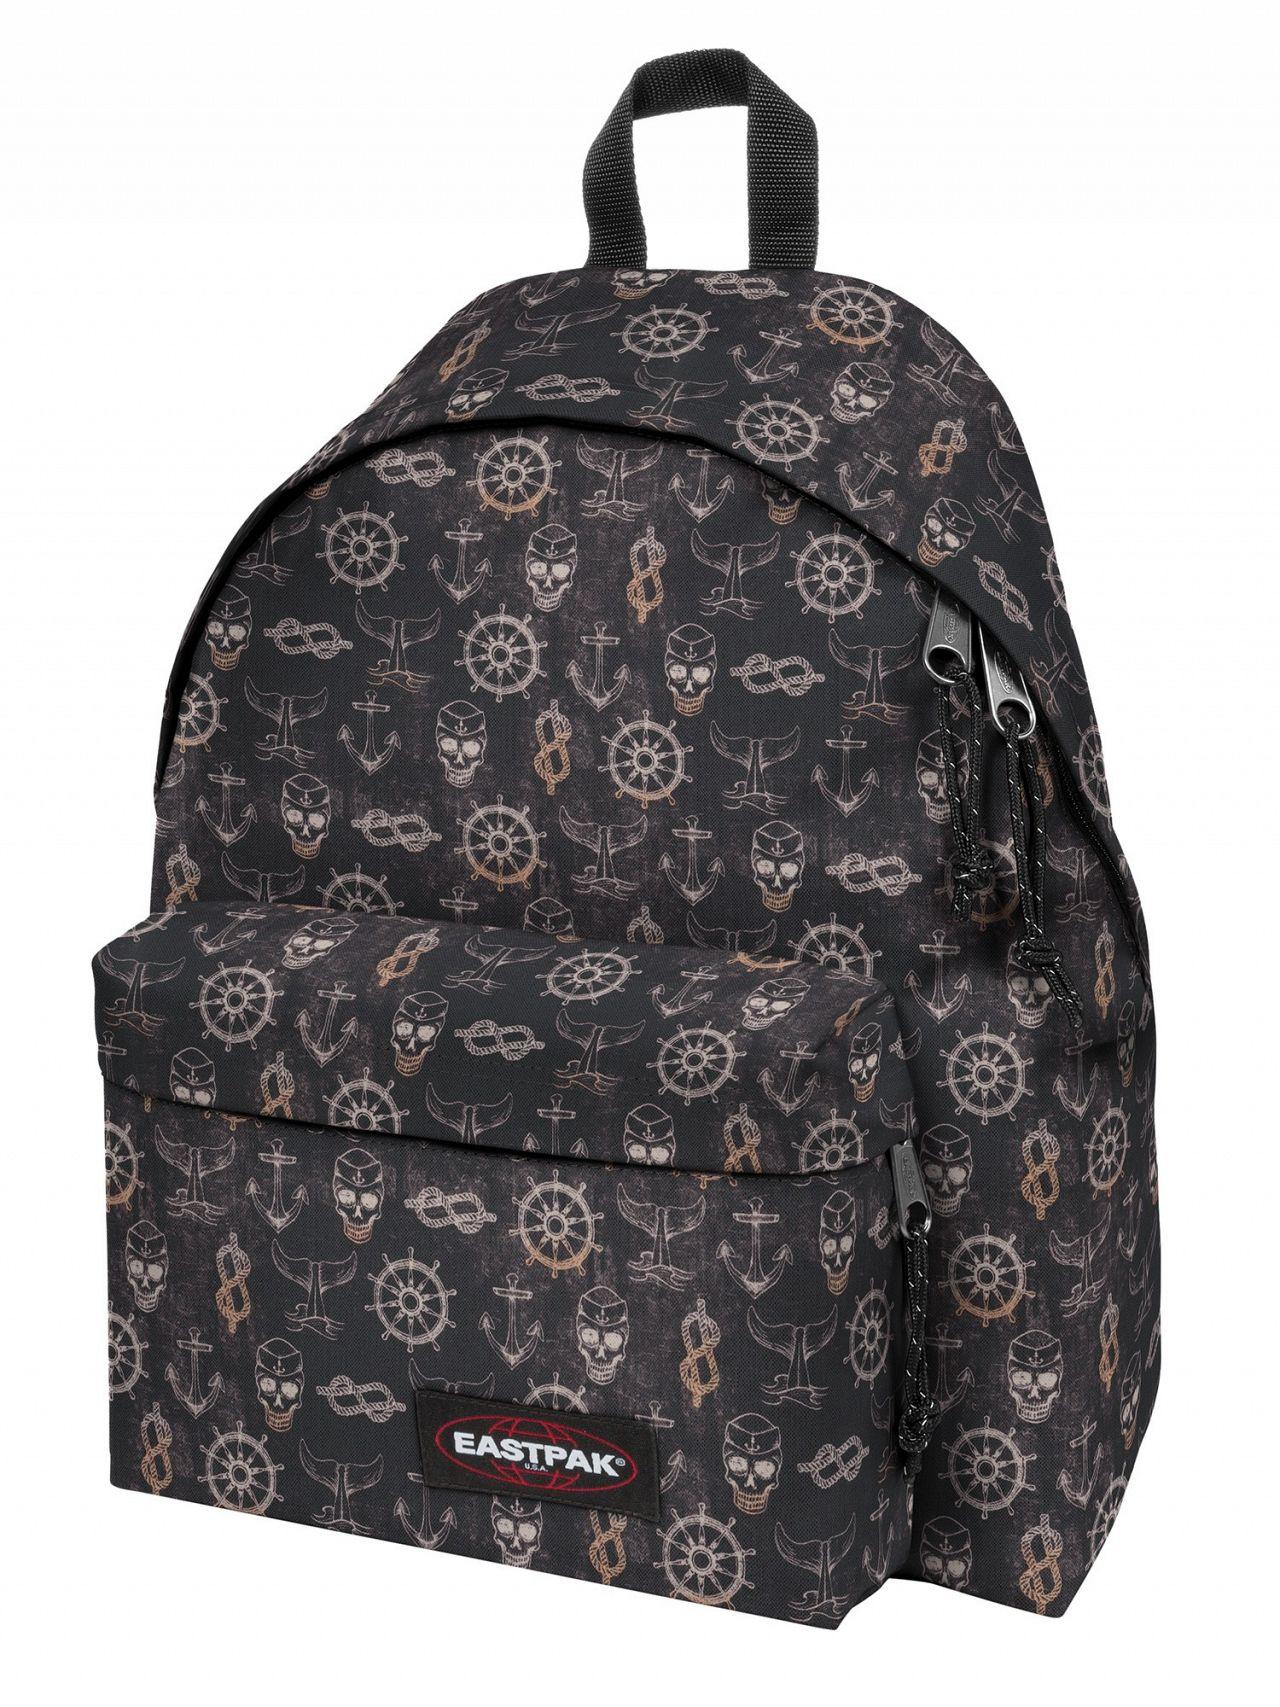 5a80c8cdde03 Eastpak Sailor Skull Padded Pak R Backpack